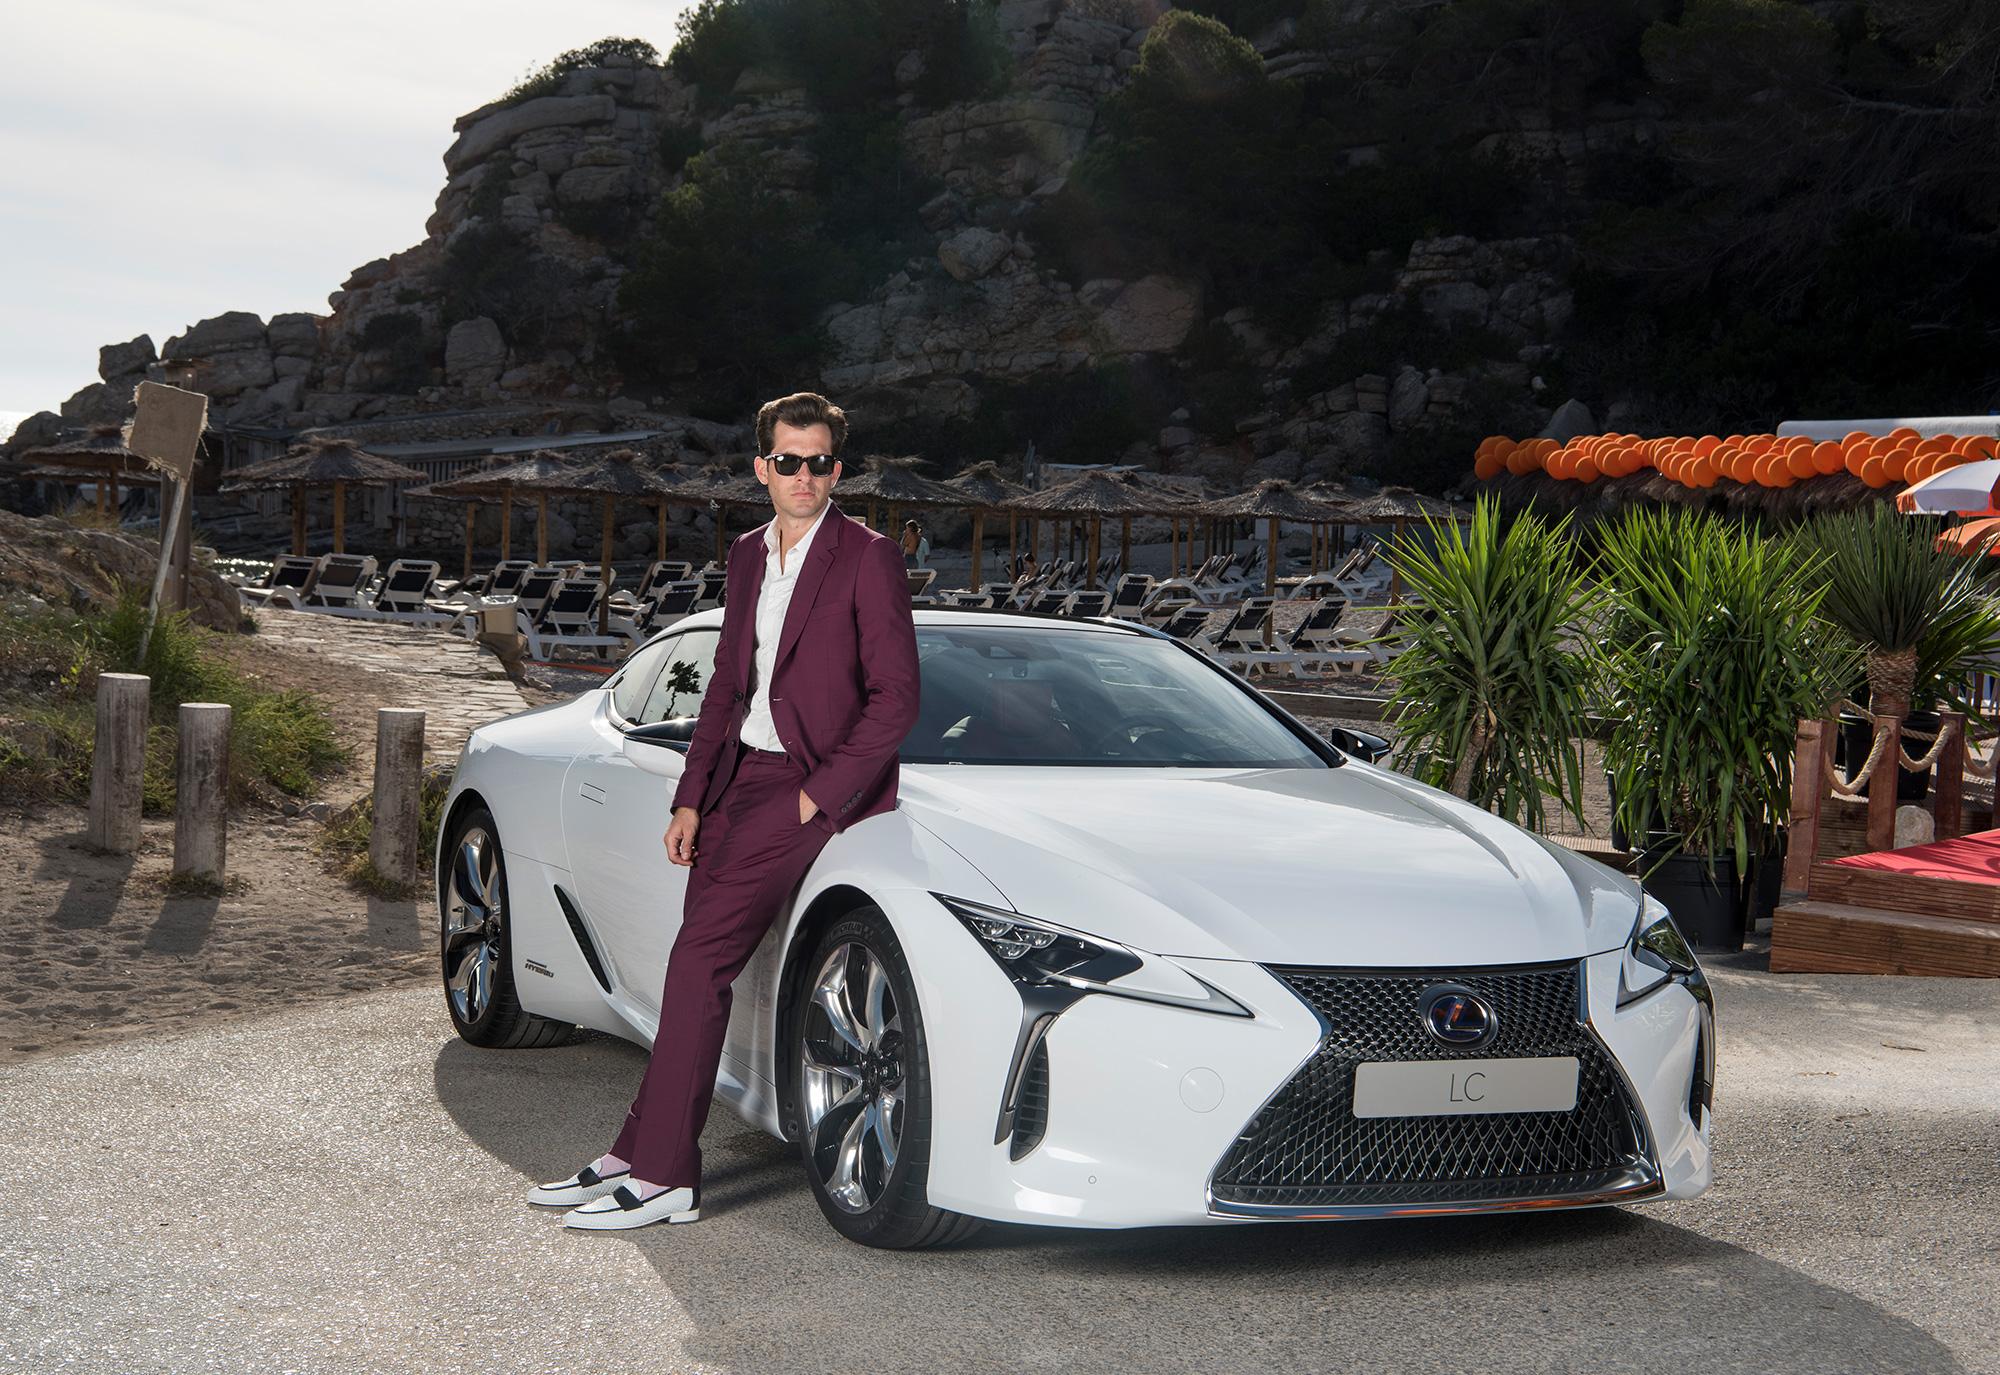 Lexus-LC-Make-Your-Mark-Mark-Ronson-Drive-4.jpg